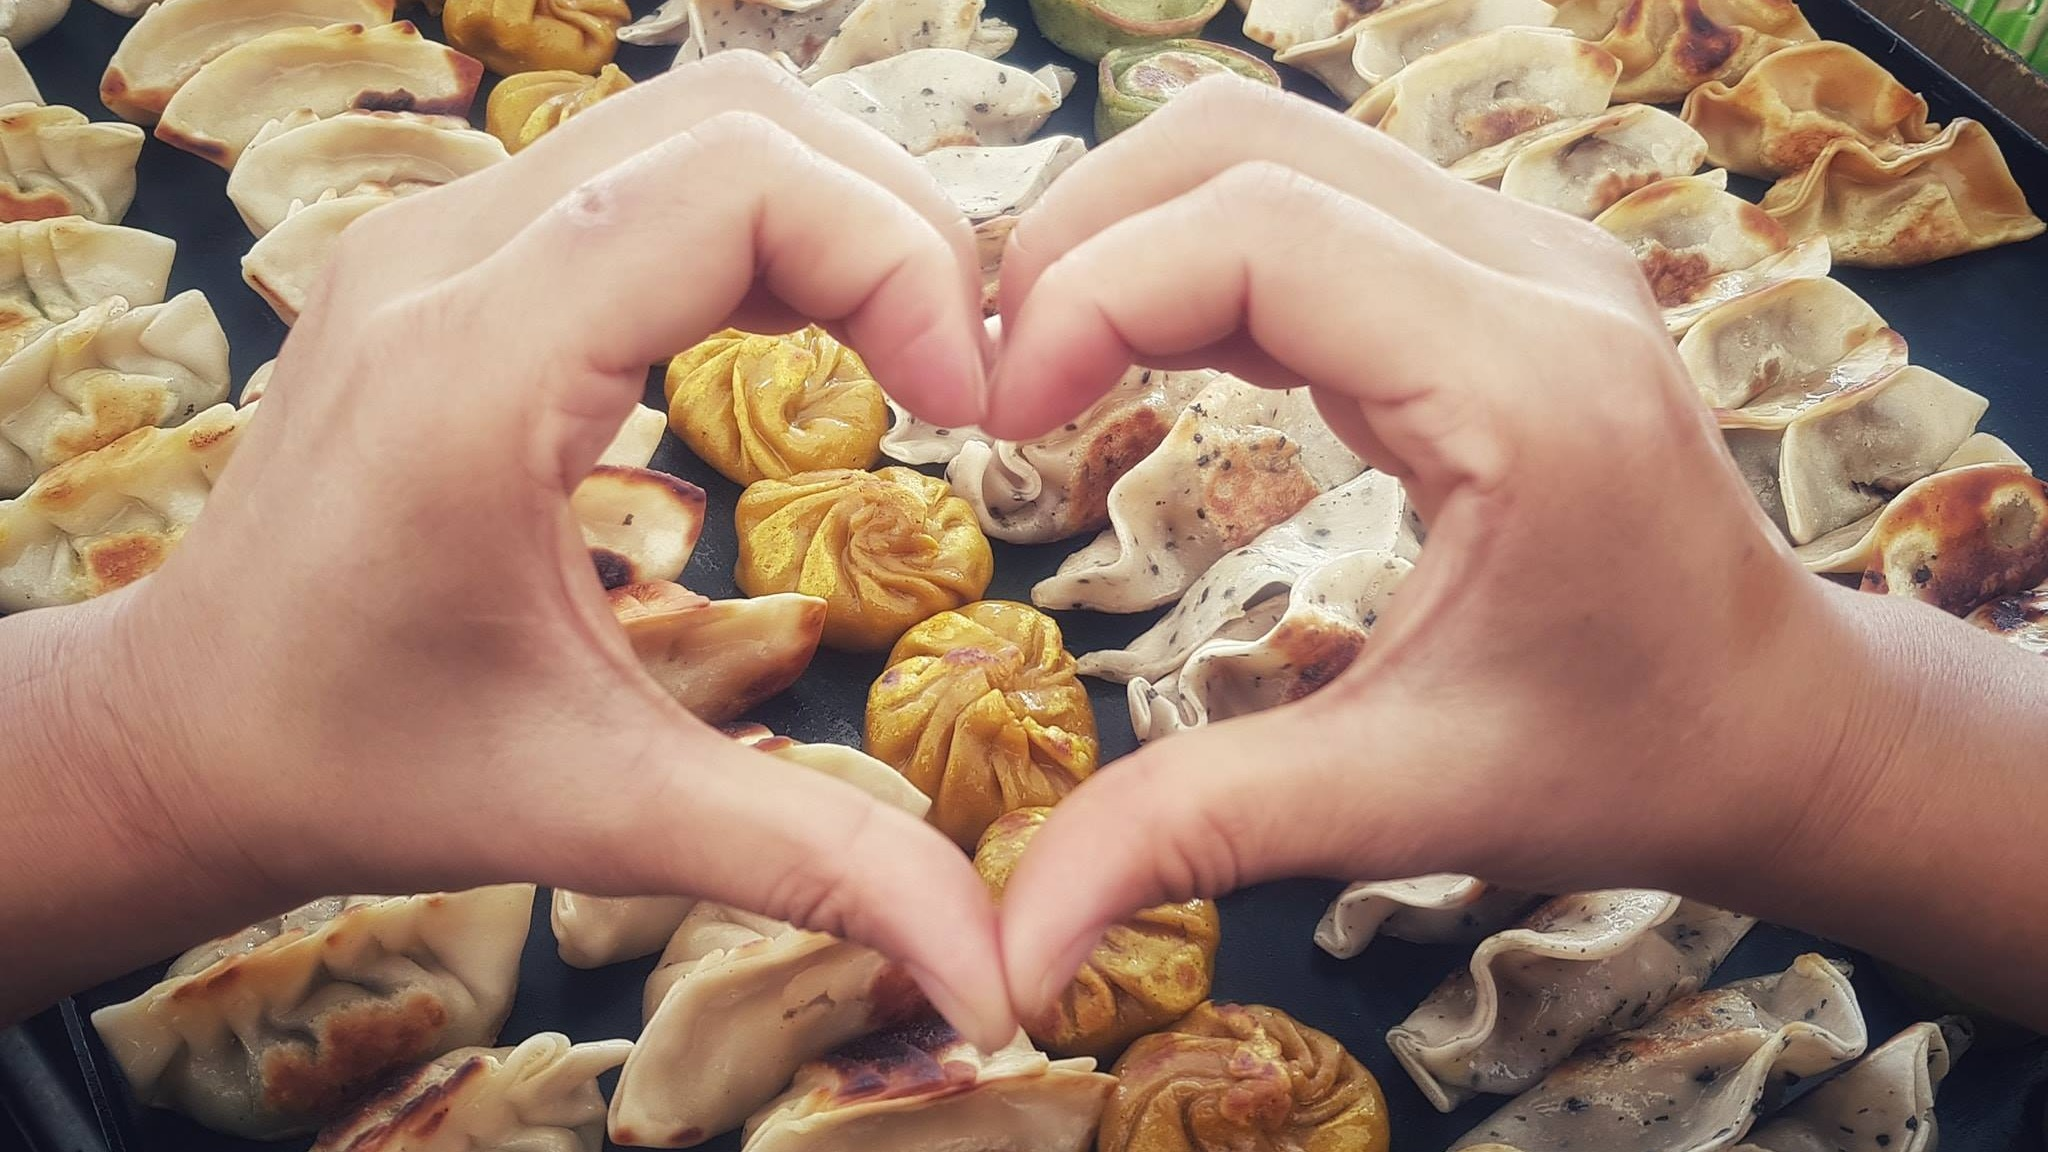 HOUSE OF DUMPLINGS - - a range of HOD's famous handmade dumplings